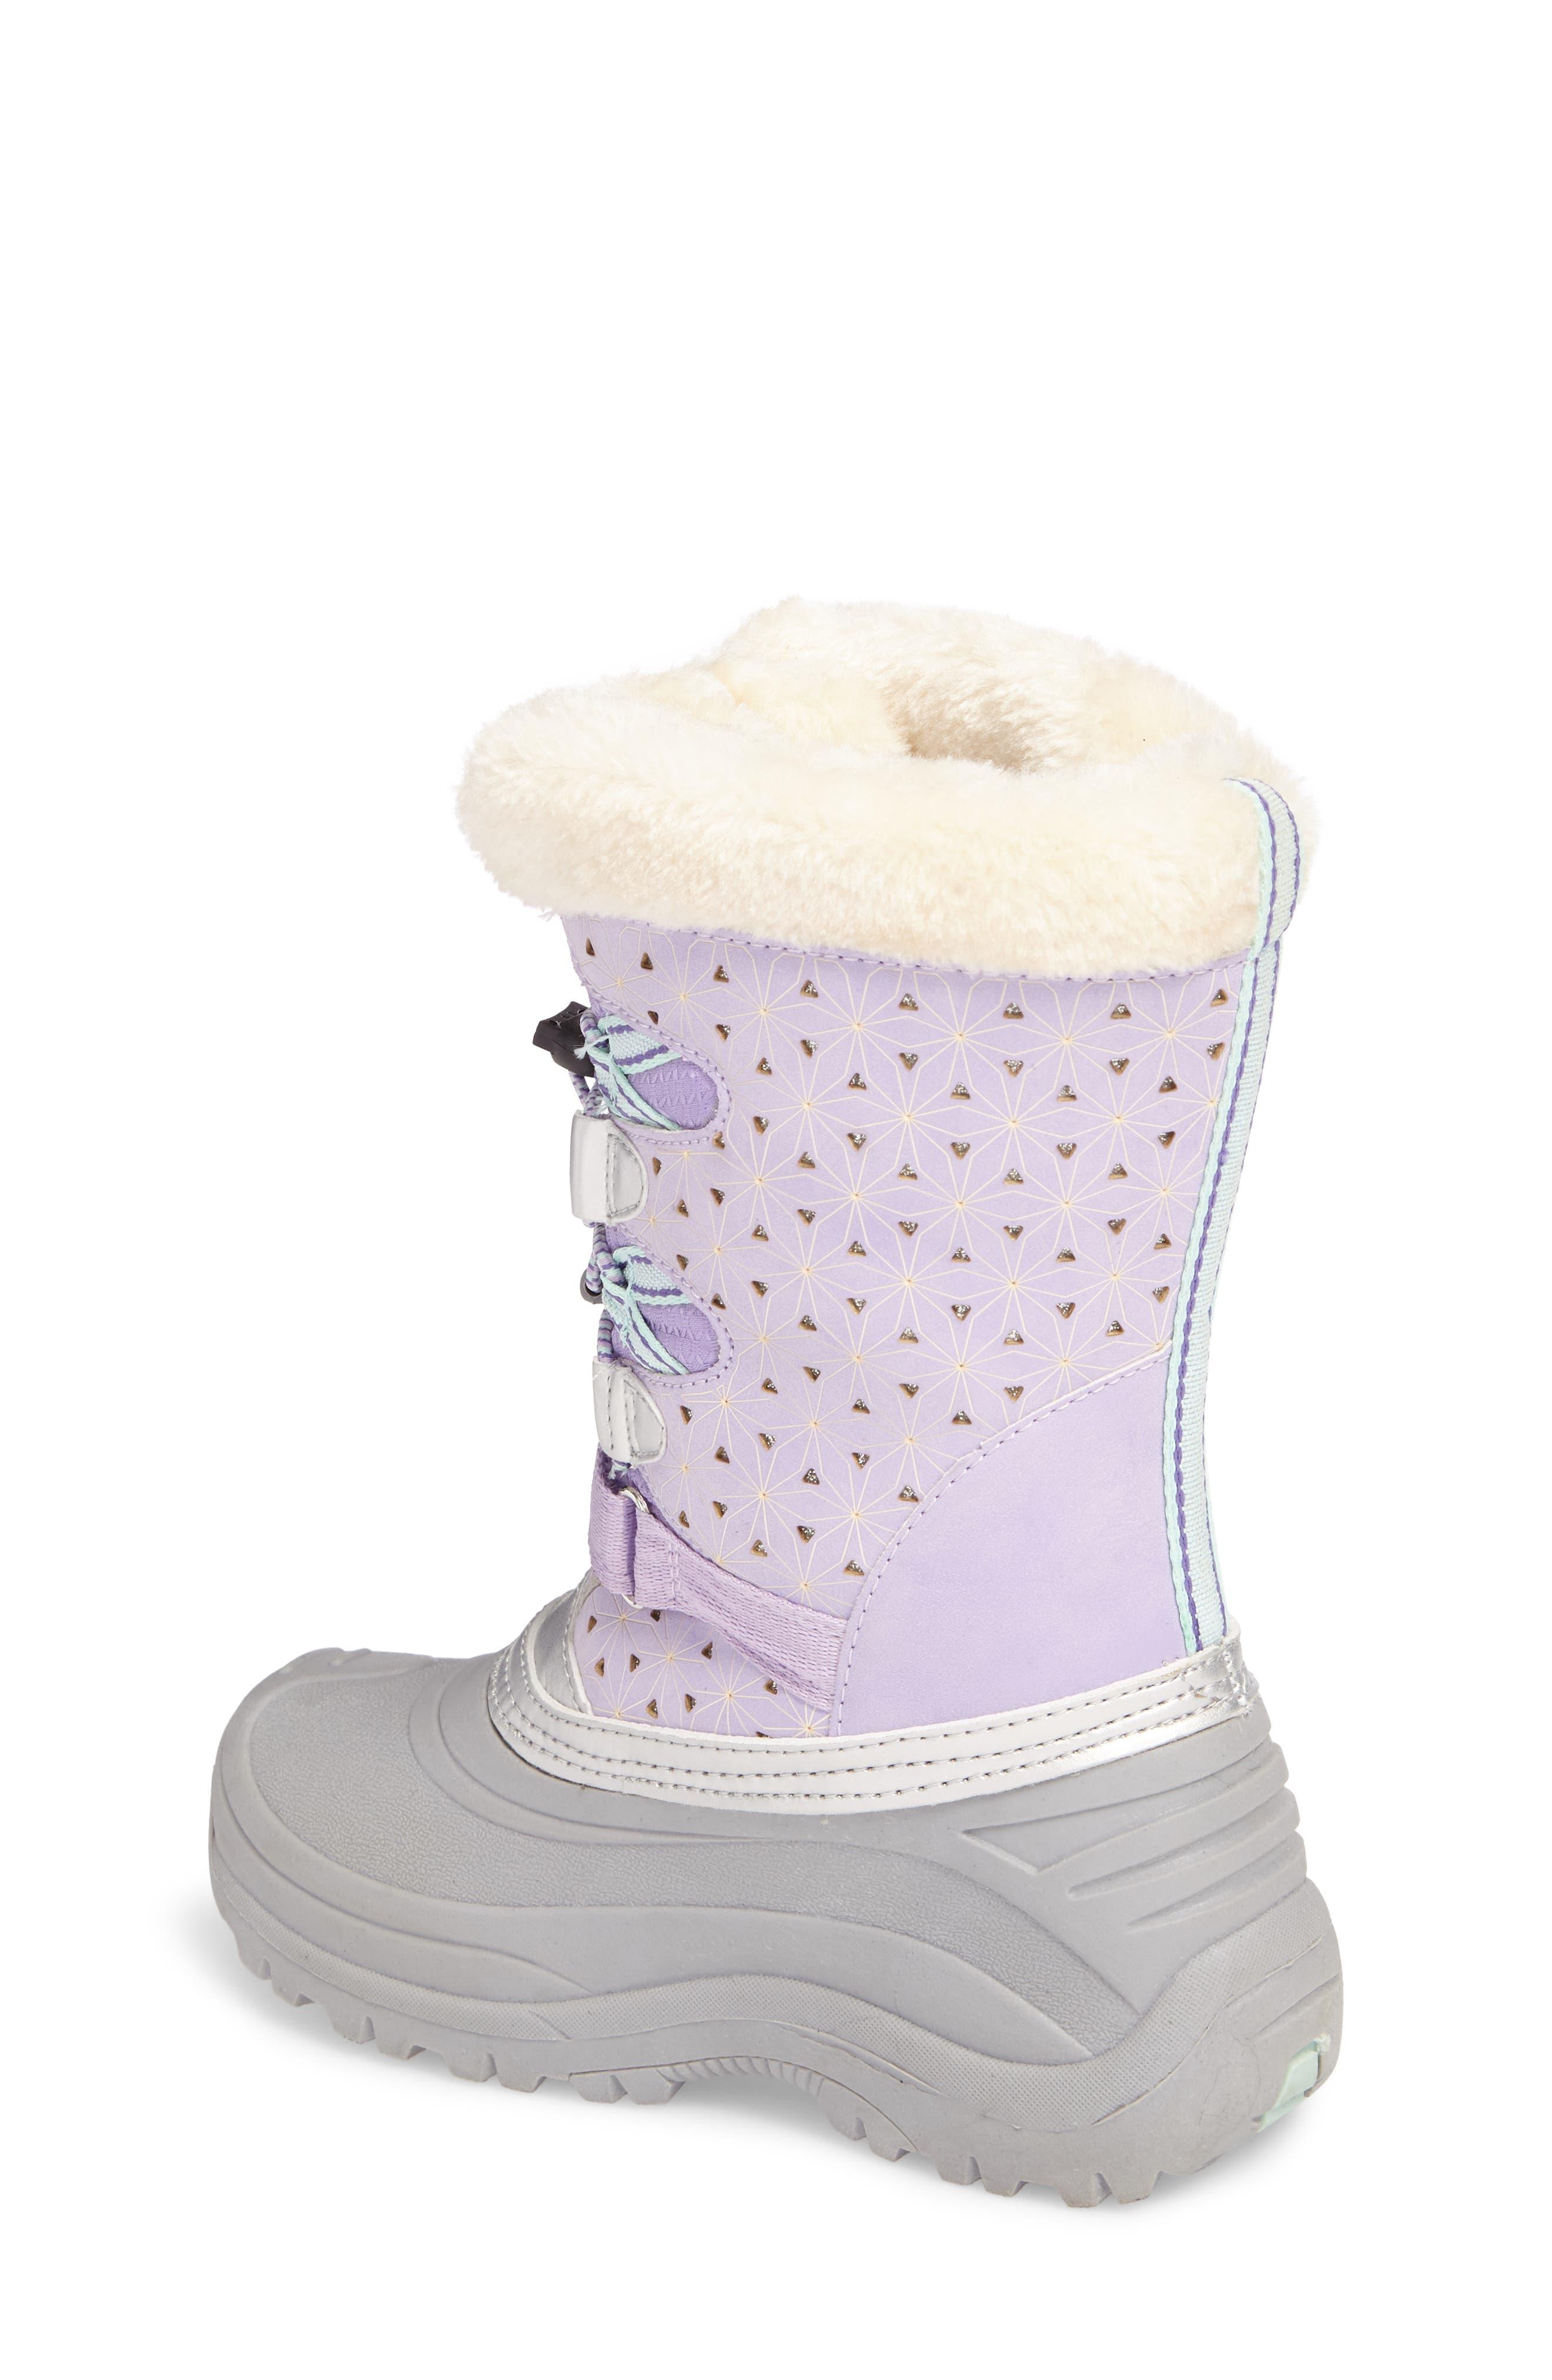 Alternate Image 2  - Jambu 'Venom' Waterproof Insulated Snow Boot (Toddler, Little Kid & Big Kid)